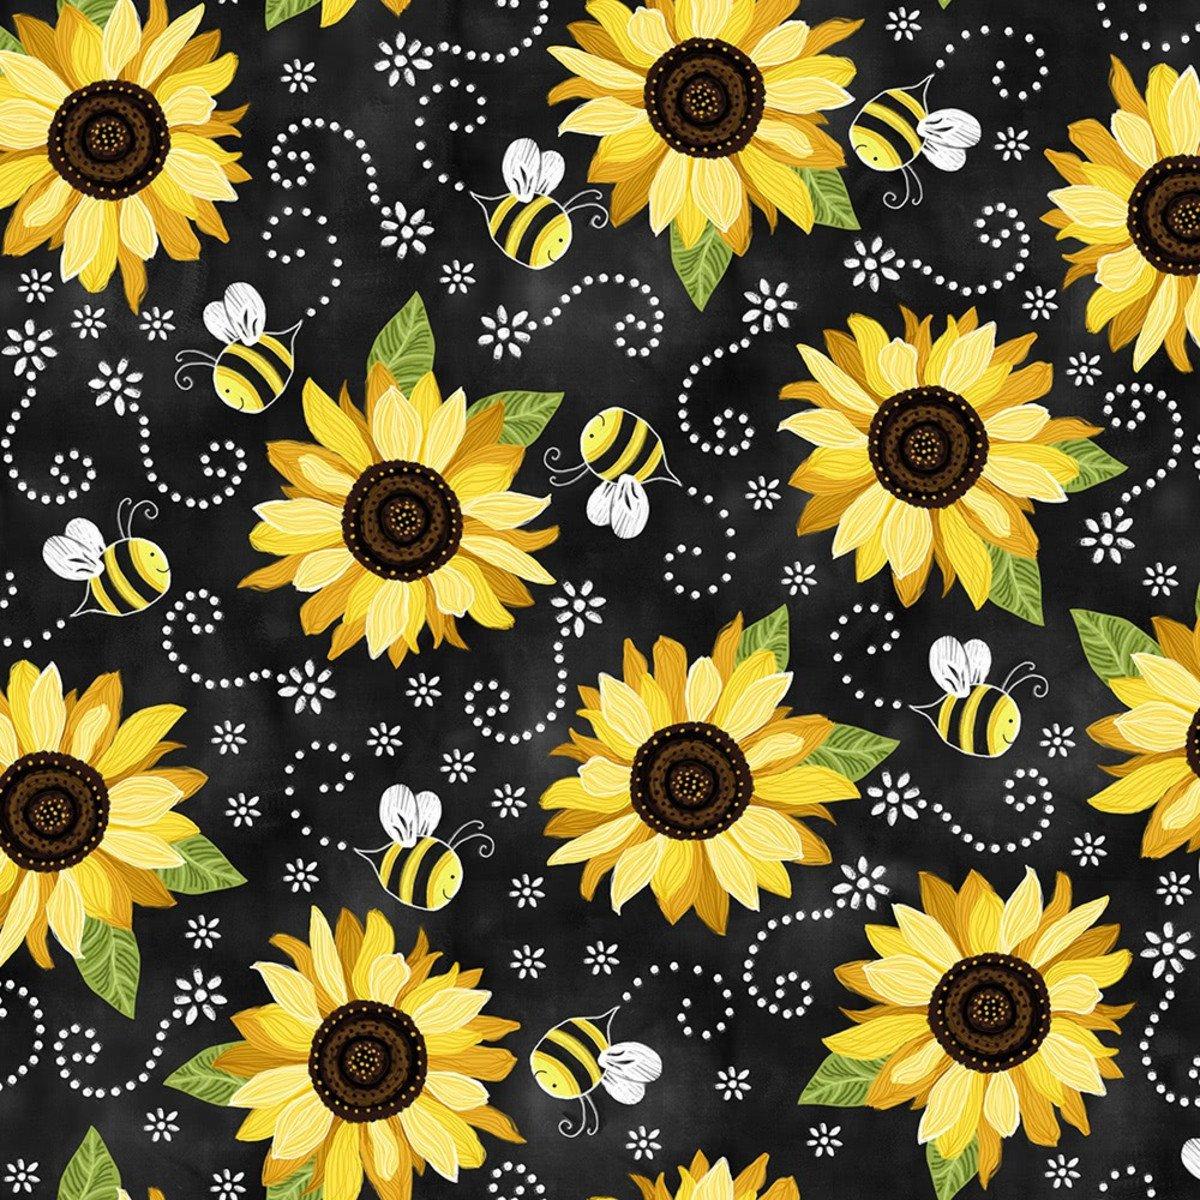 Sunflower and Bee Chalkboard Print Minky Timeless Treasures